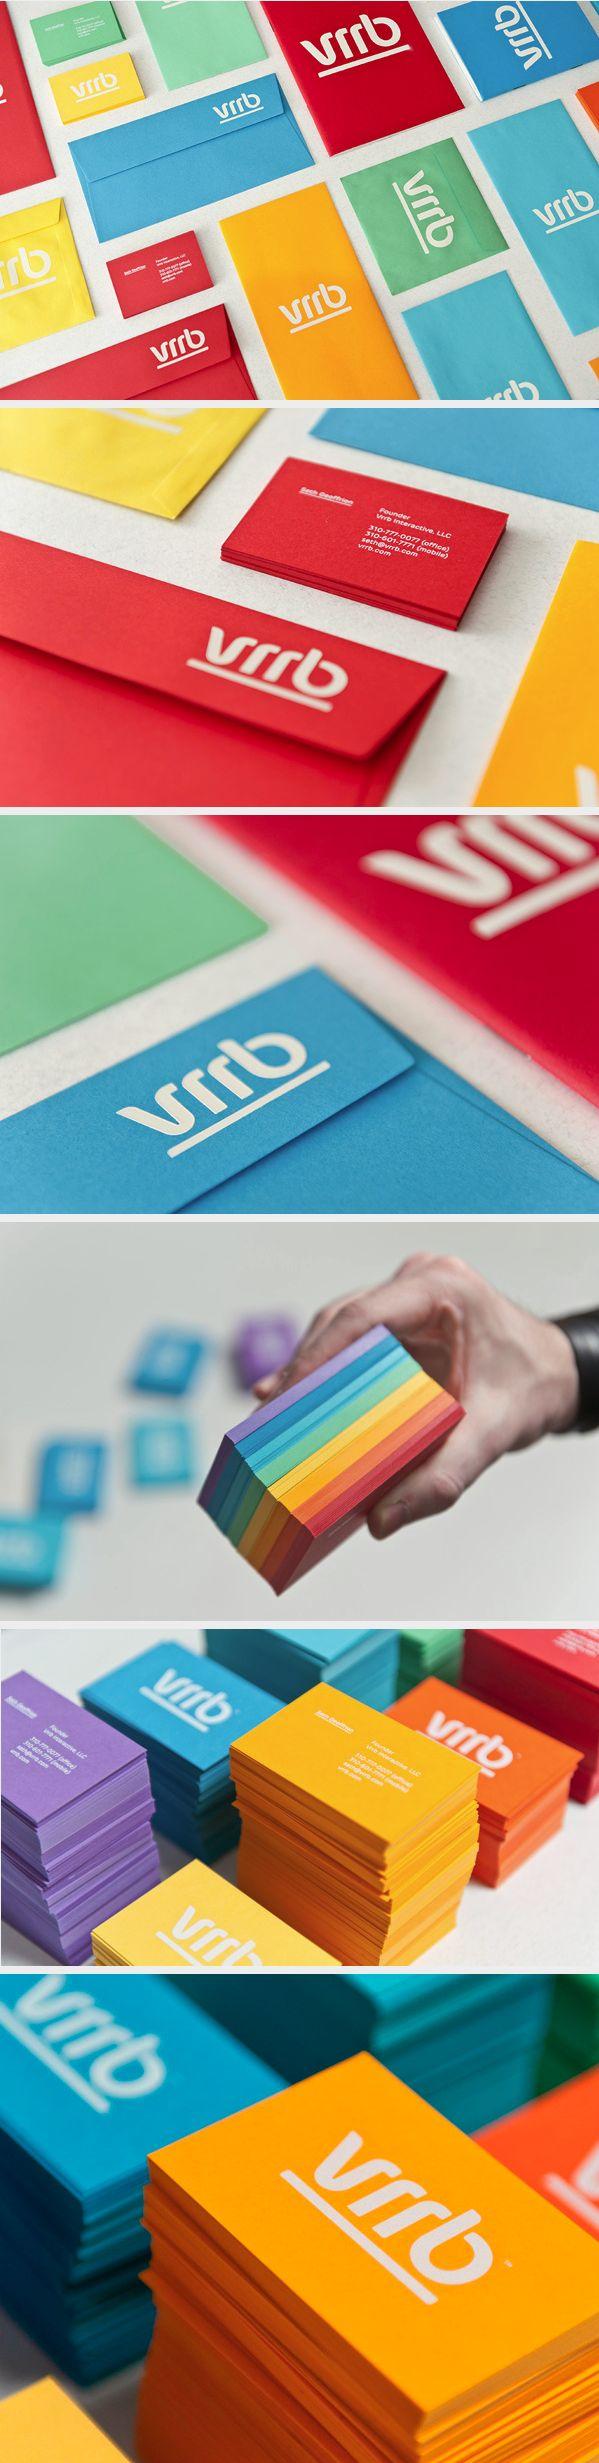 #card #businesscard #graphicdesign #design #branding #brand